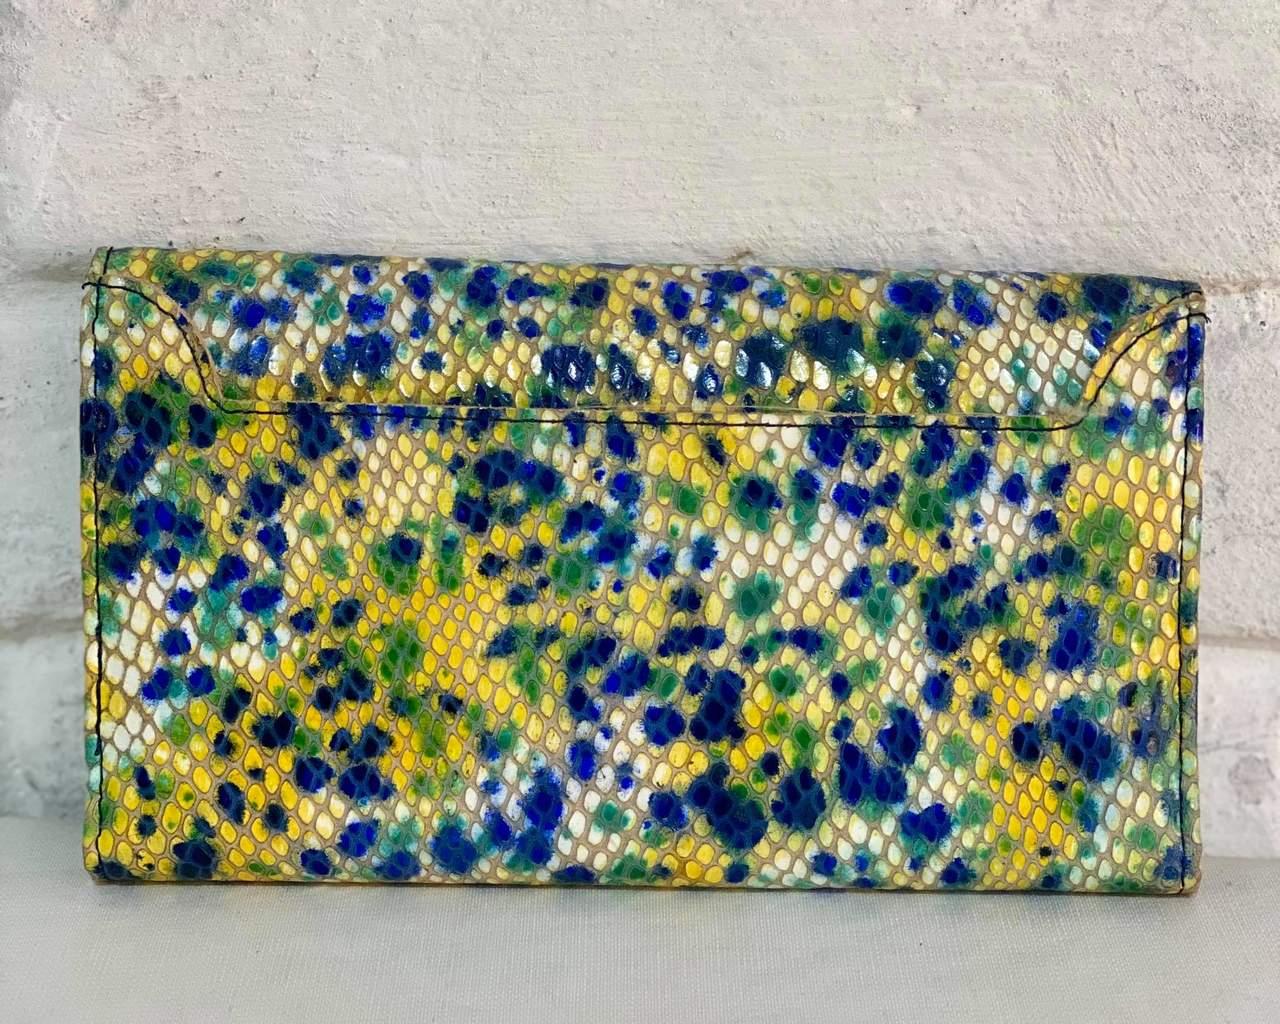 Carteira Feminina 3407 Colorida Azul/Verde/Amarela